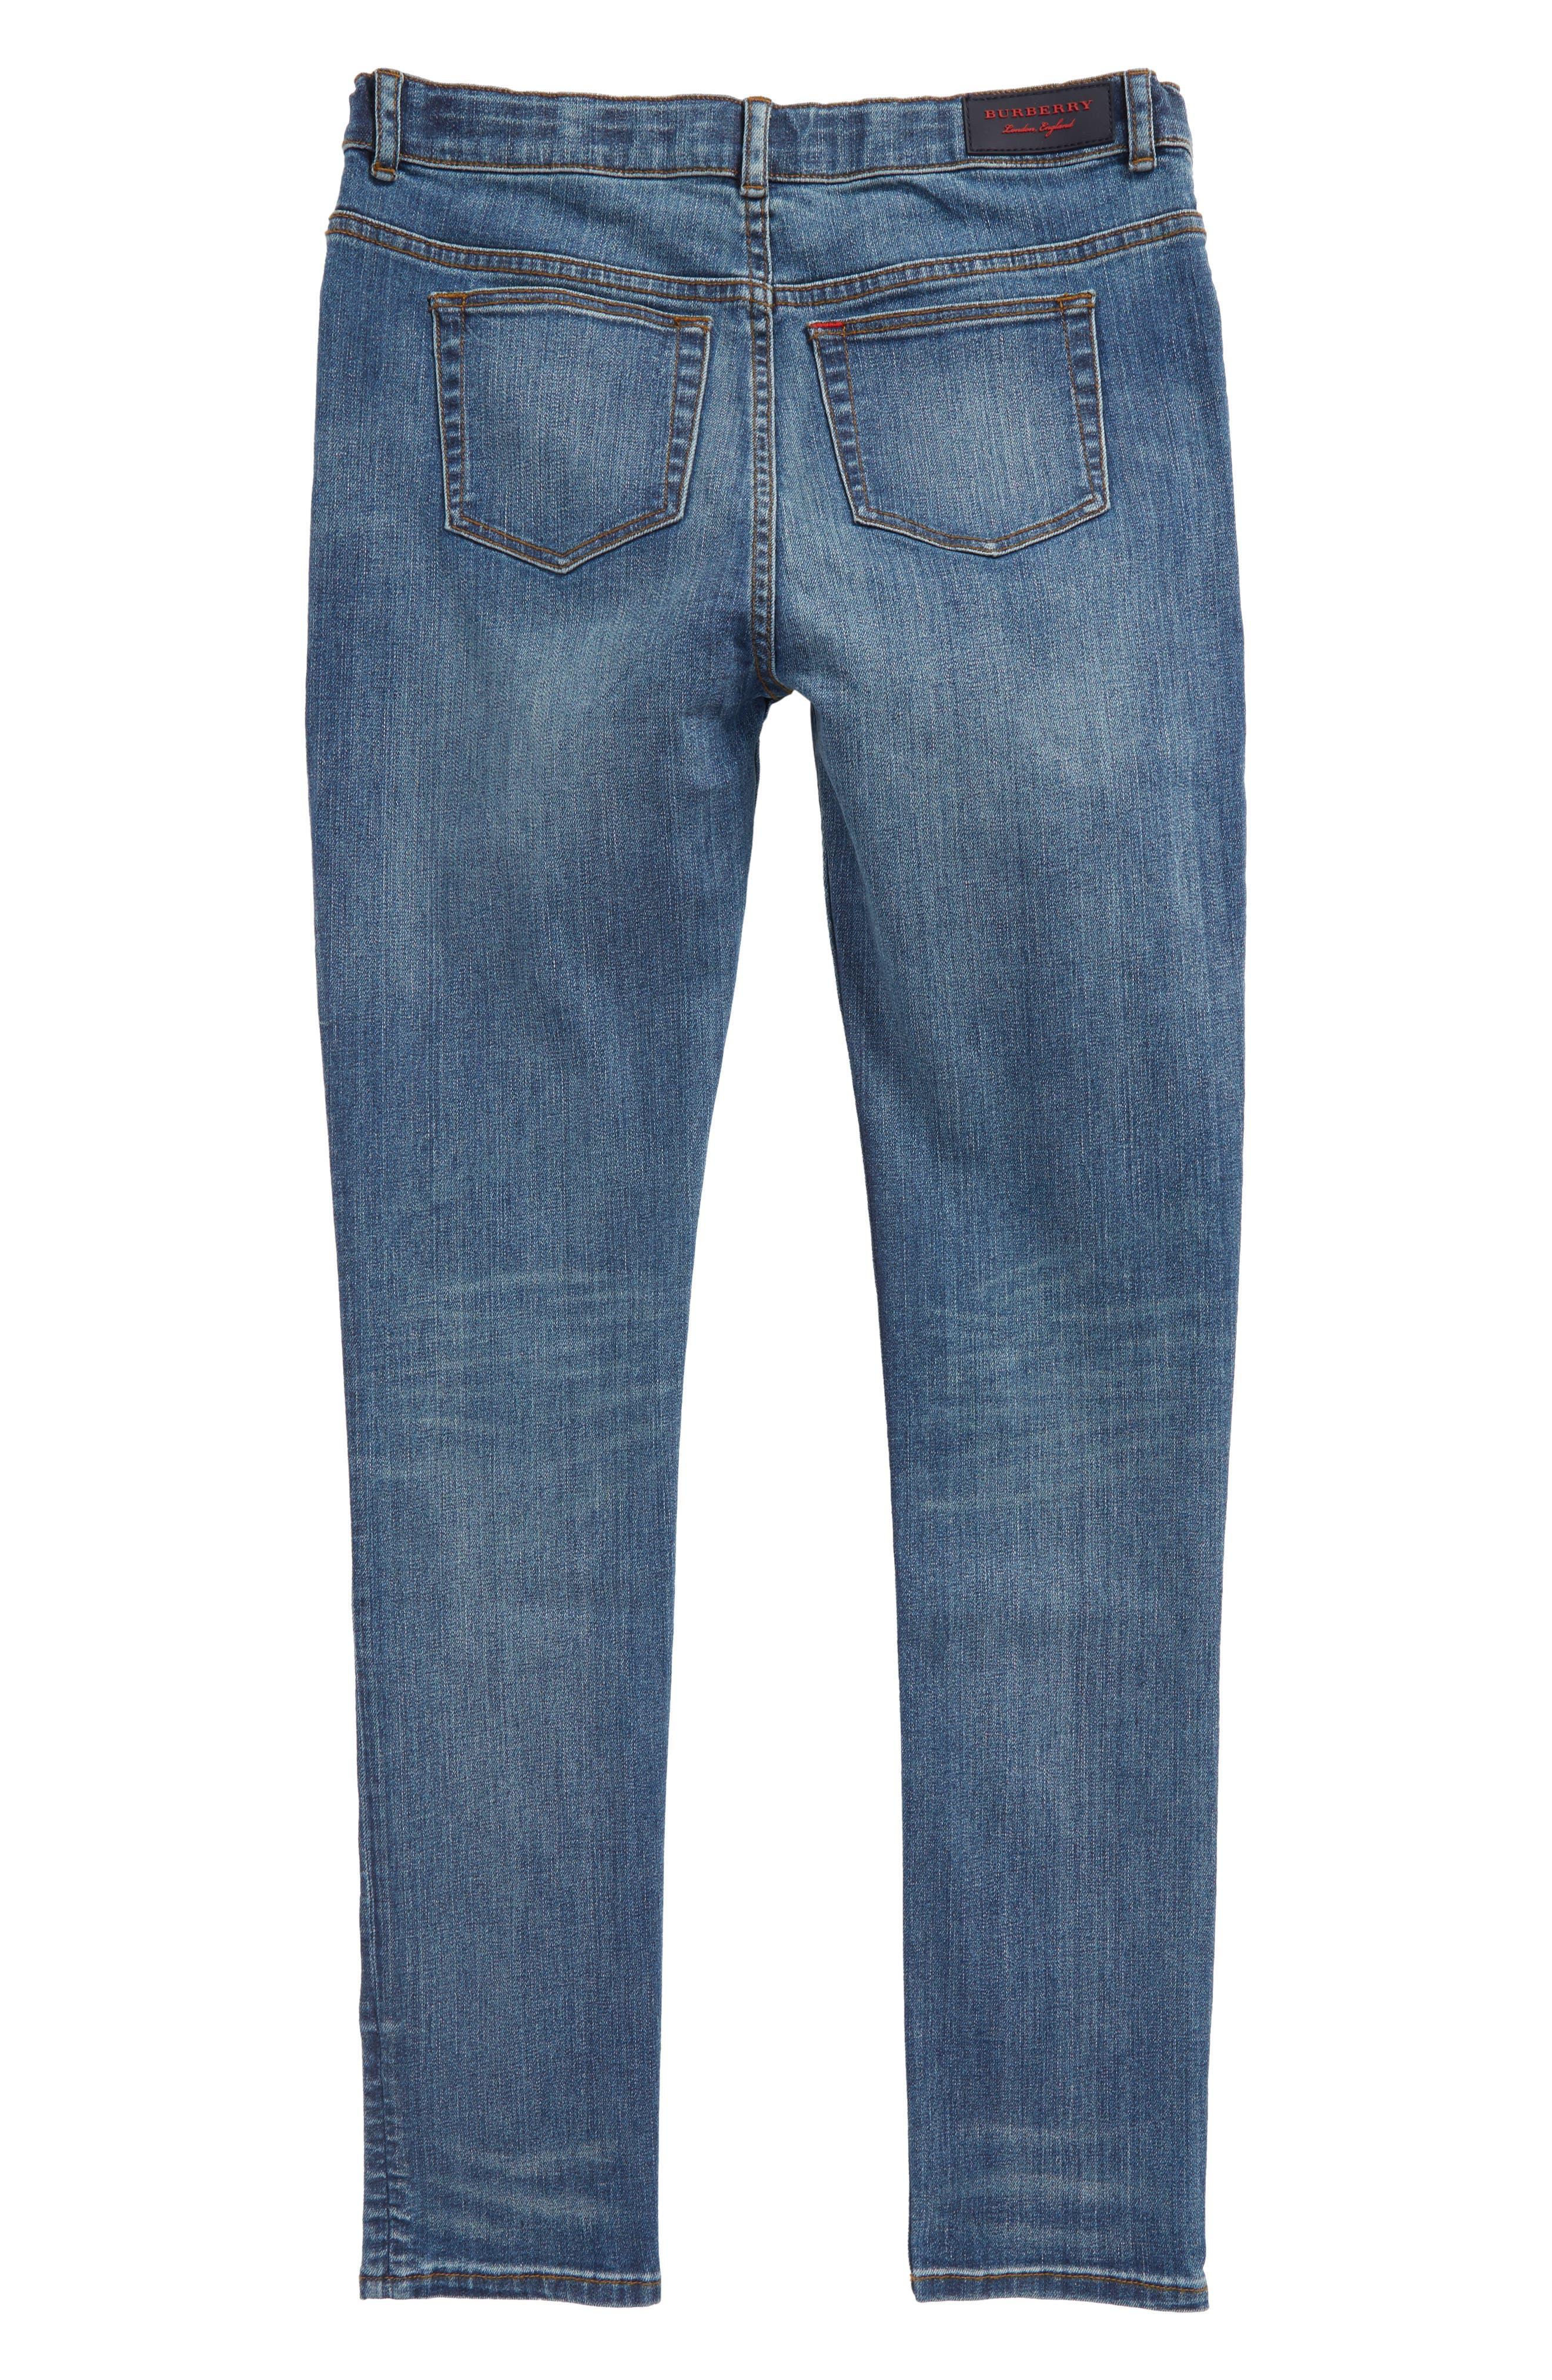 Skinny Jeans,                             Alternate thumbnail 2, color,                             Medium Indigo